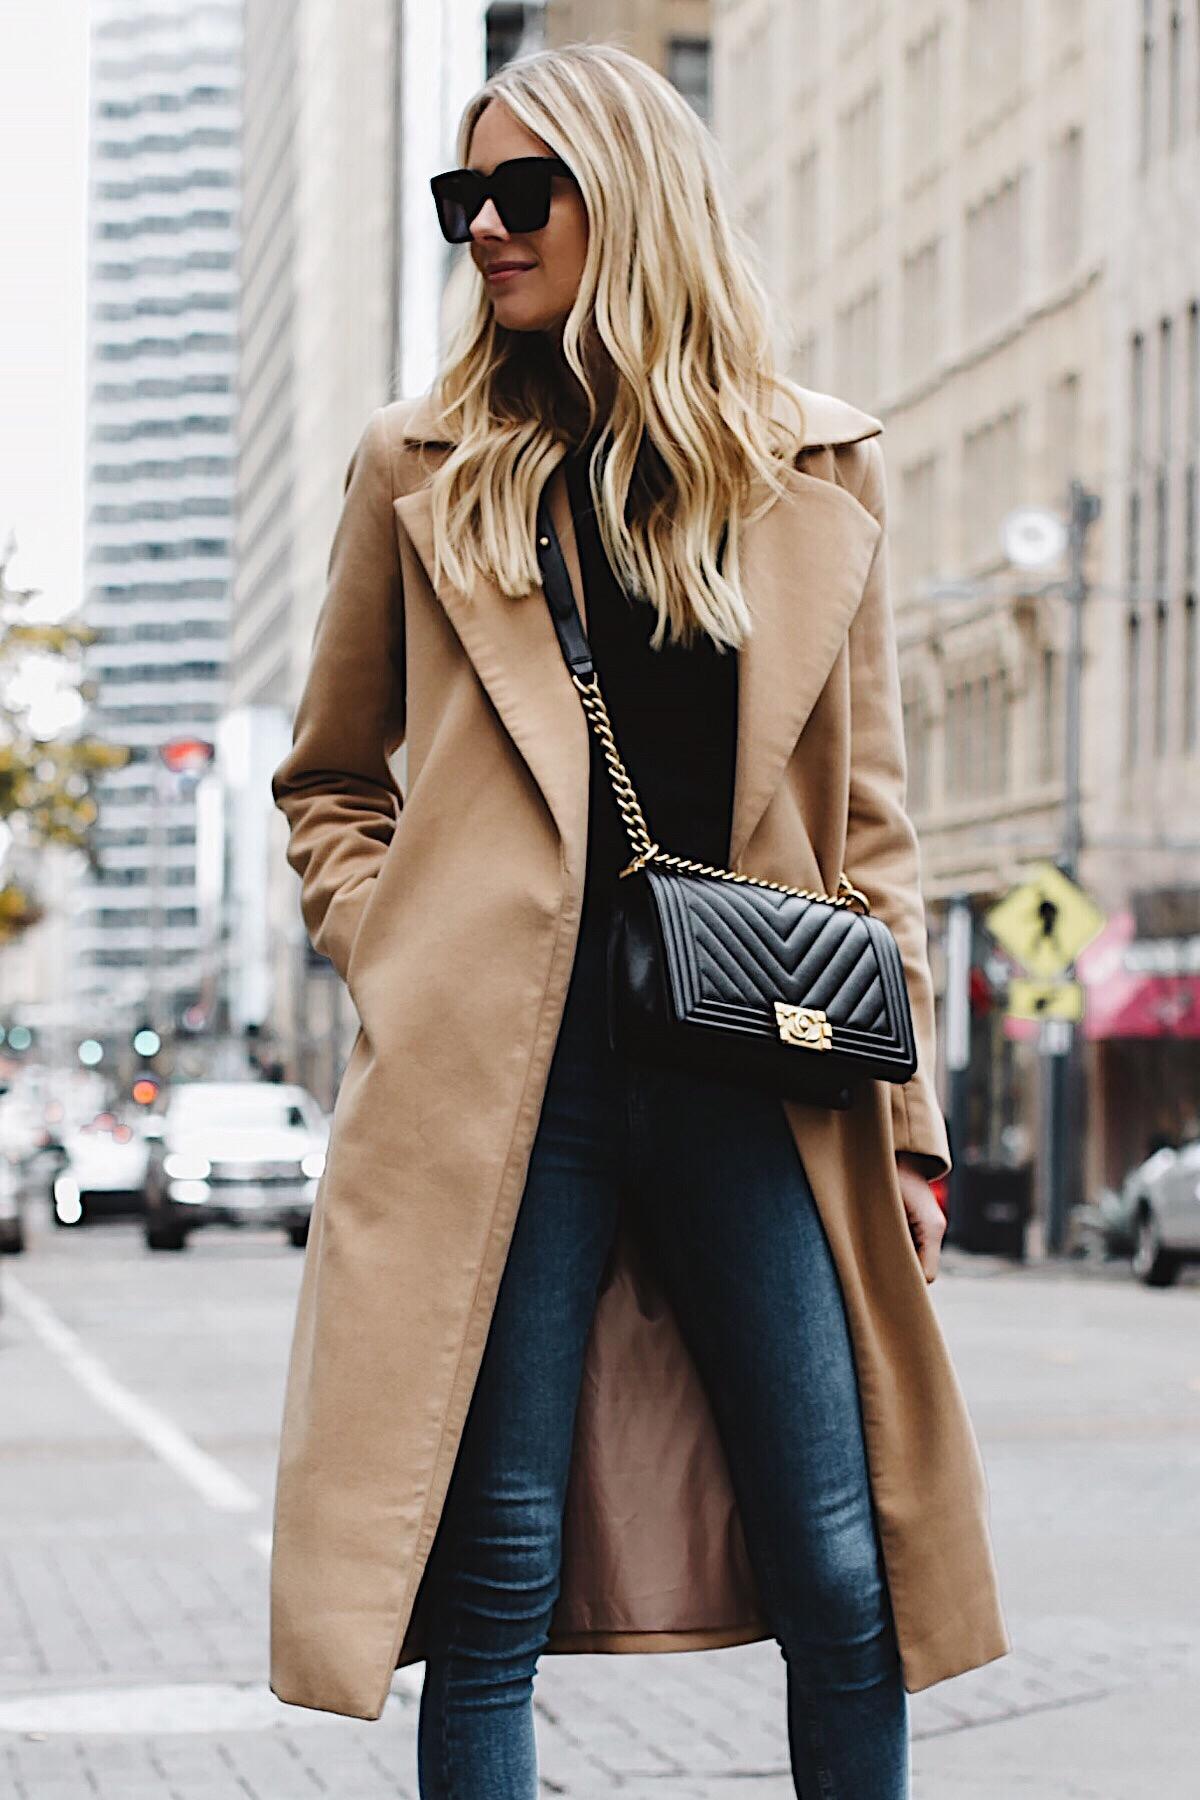 blonde woman wearing long camel coat black sweater topshop denim skinny jeans chanel black boy bag fashion jackson dallas blogger fashion blogger street style